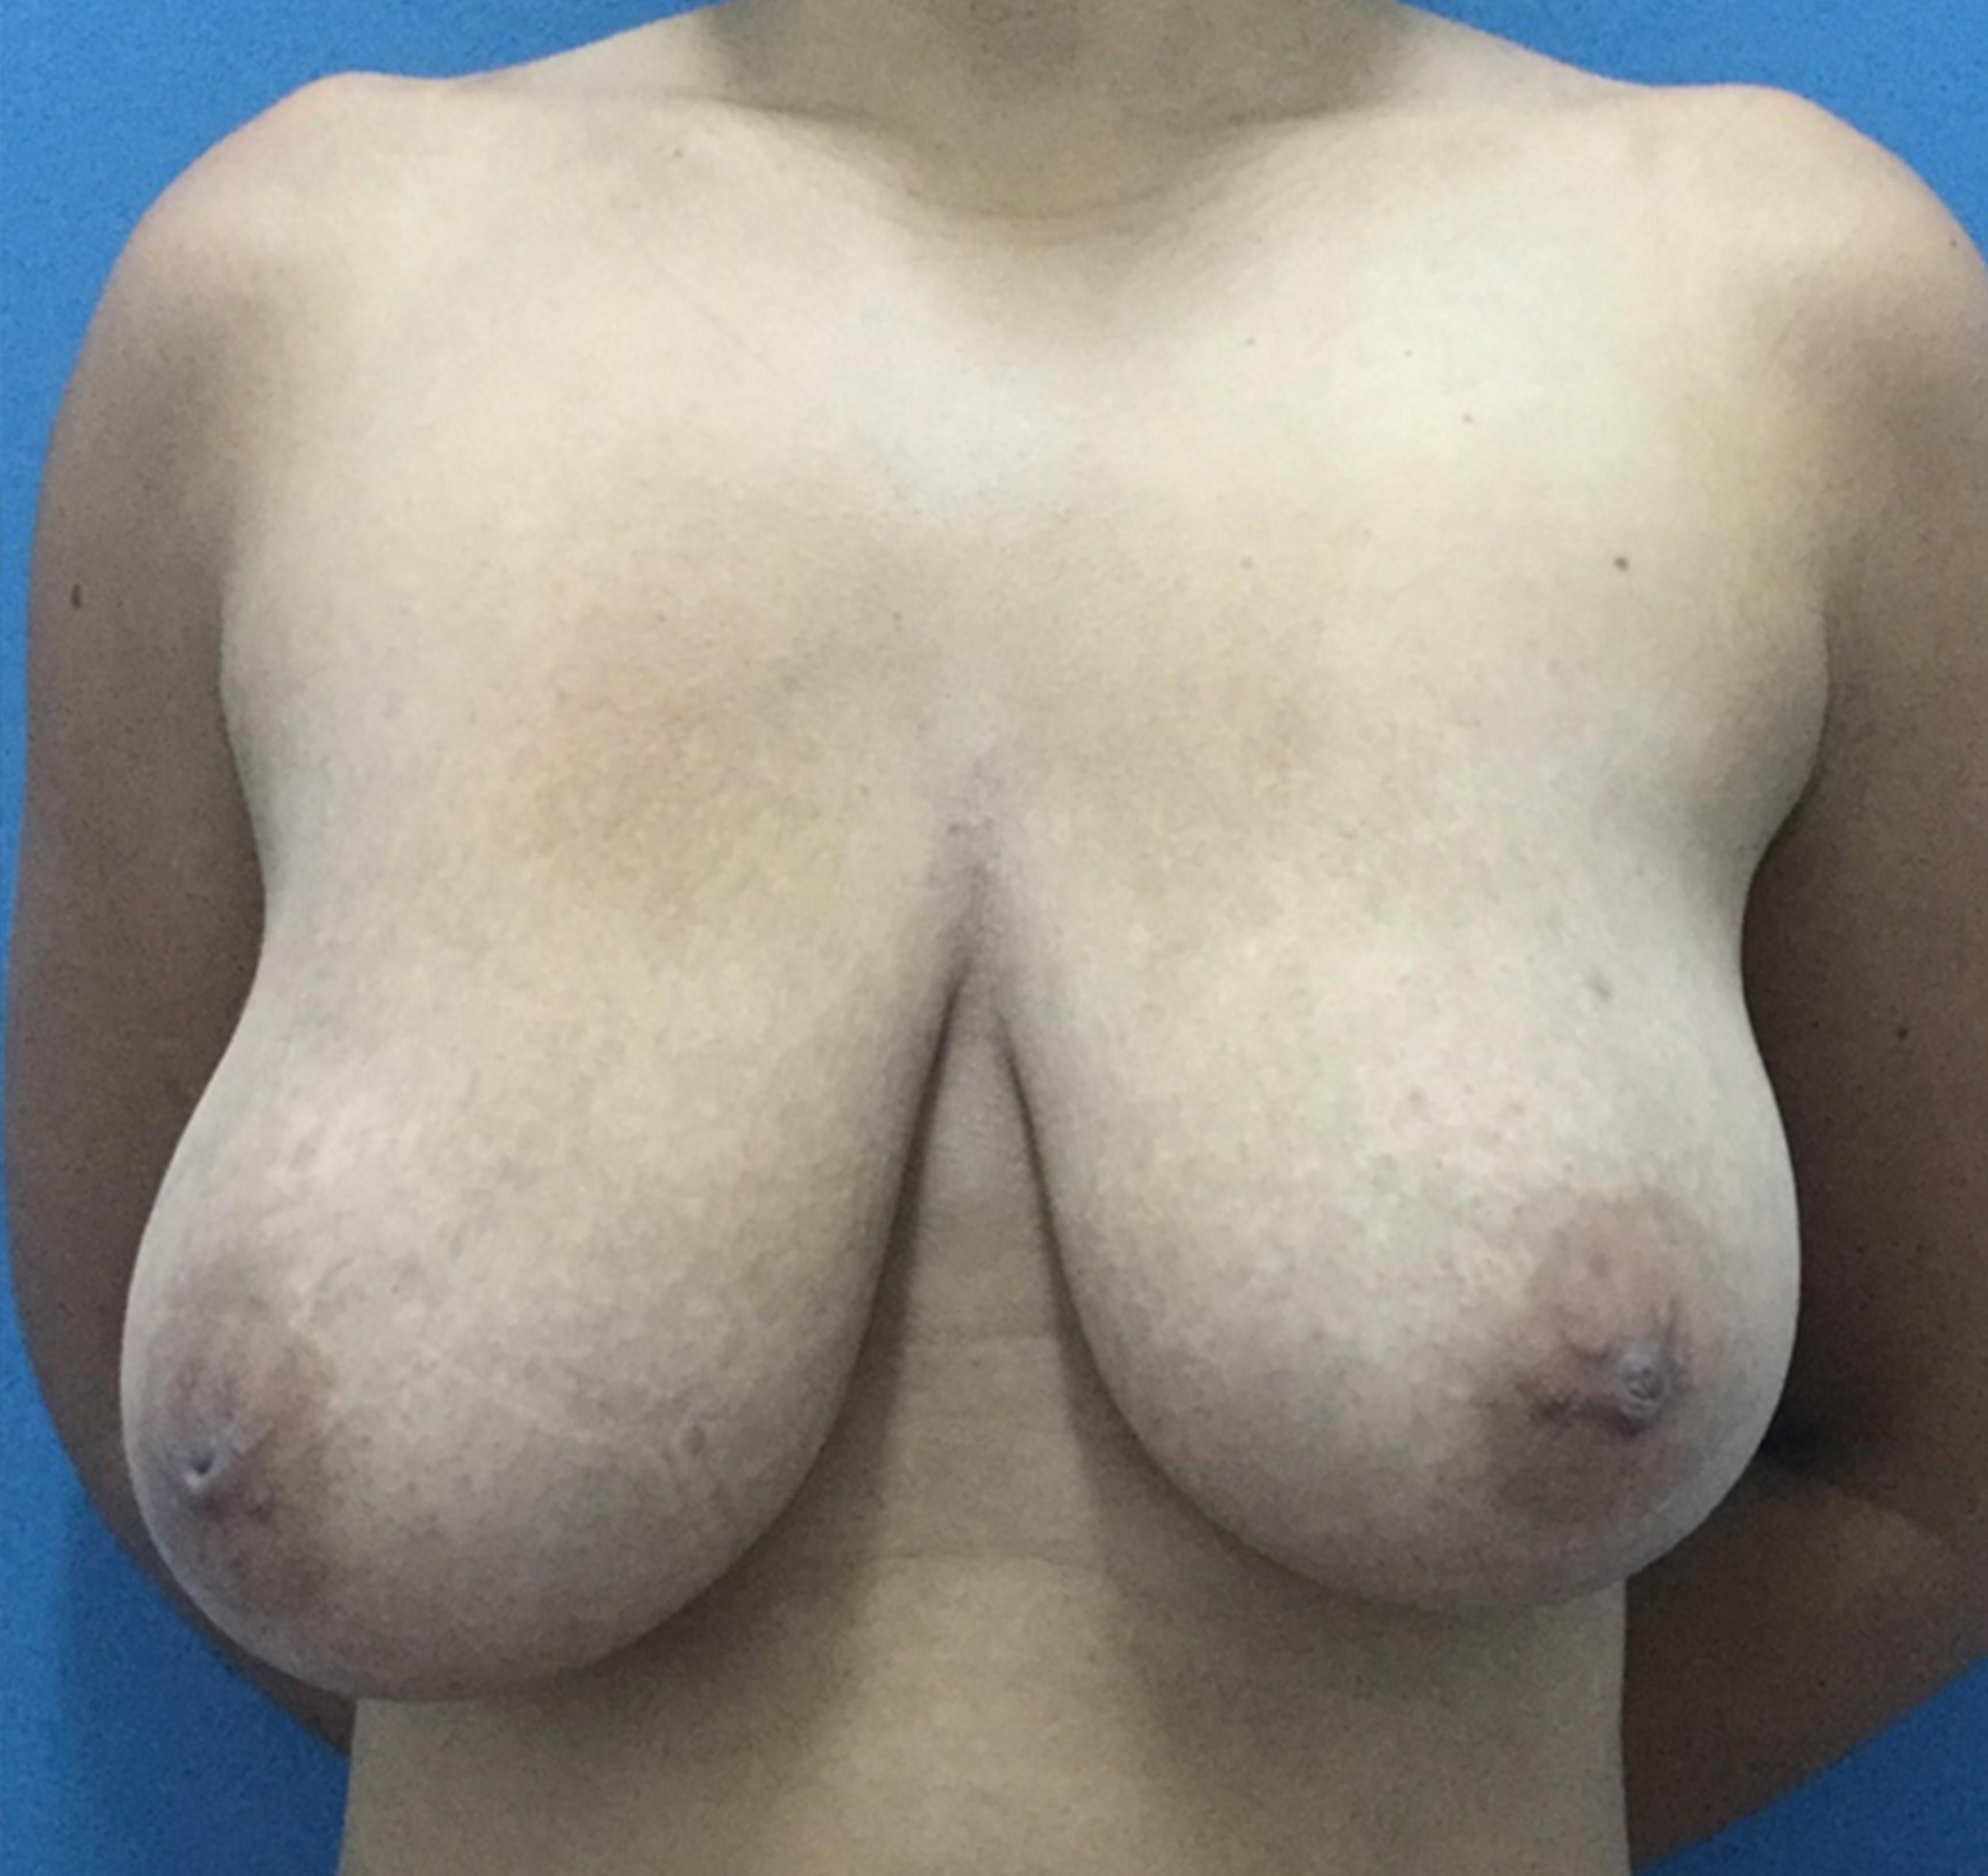 reduccion-con-implante